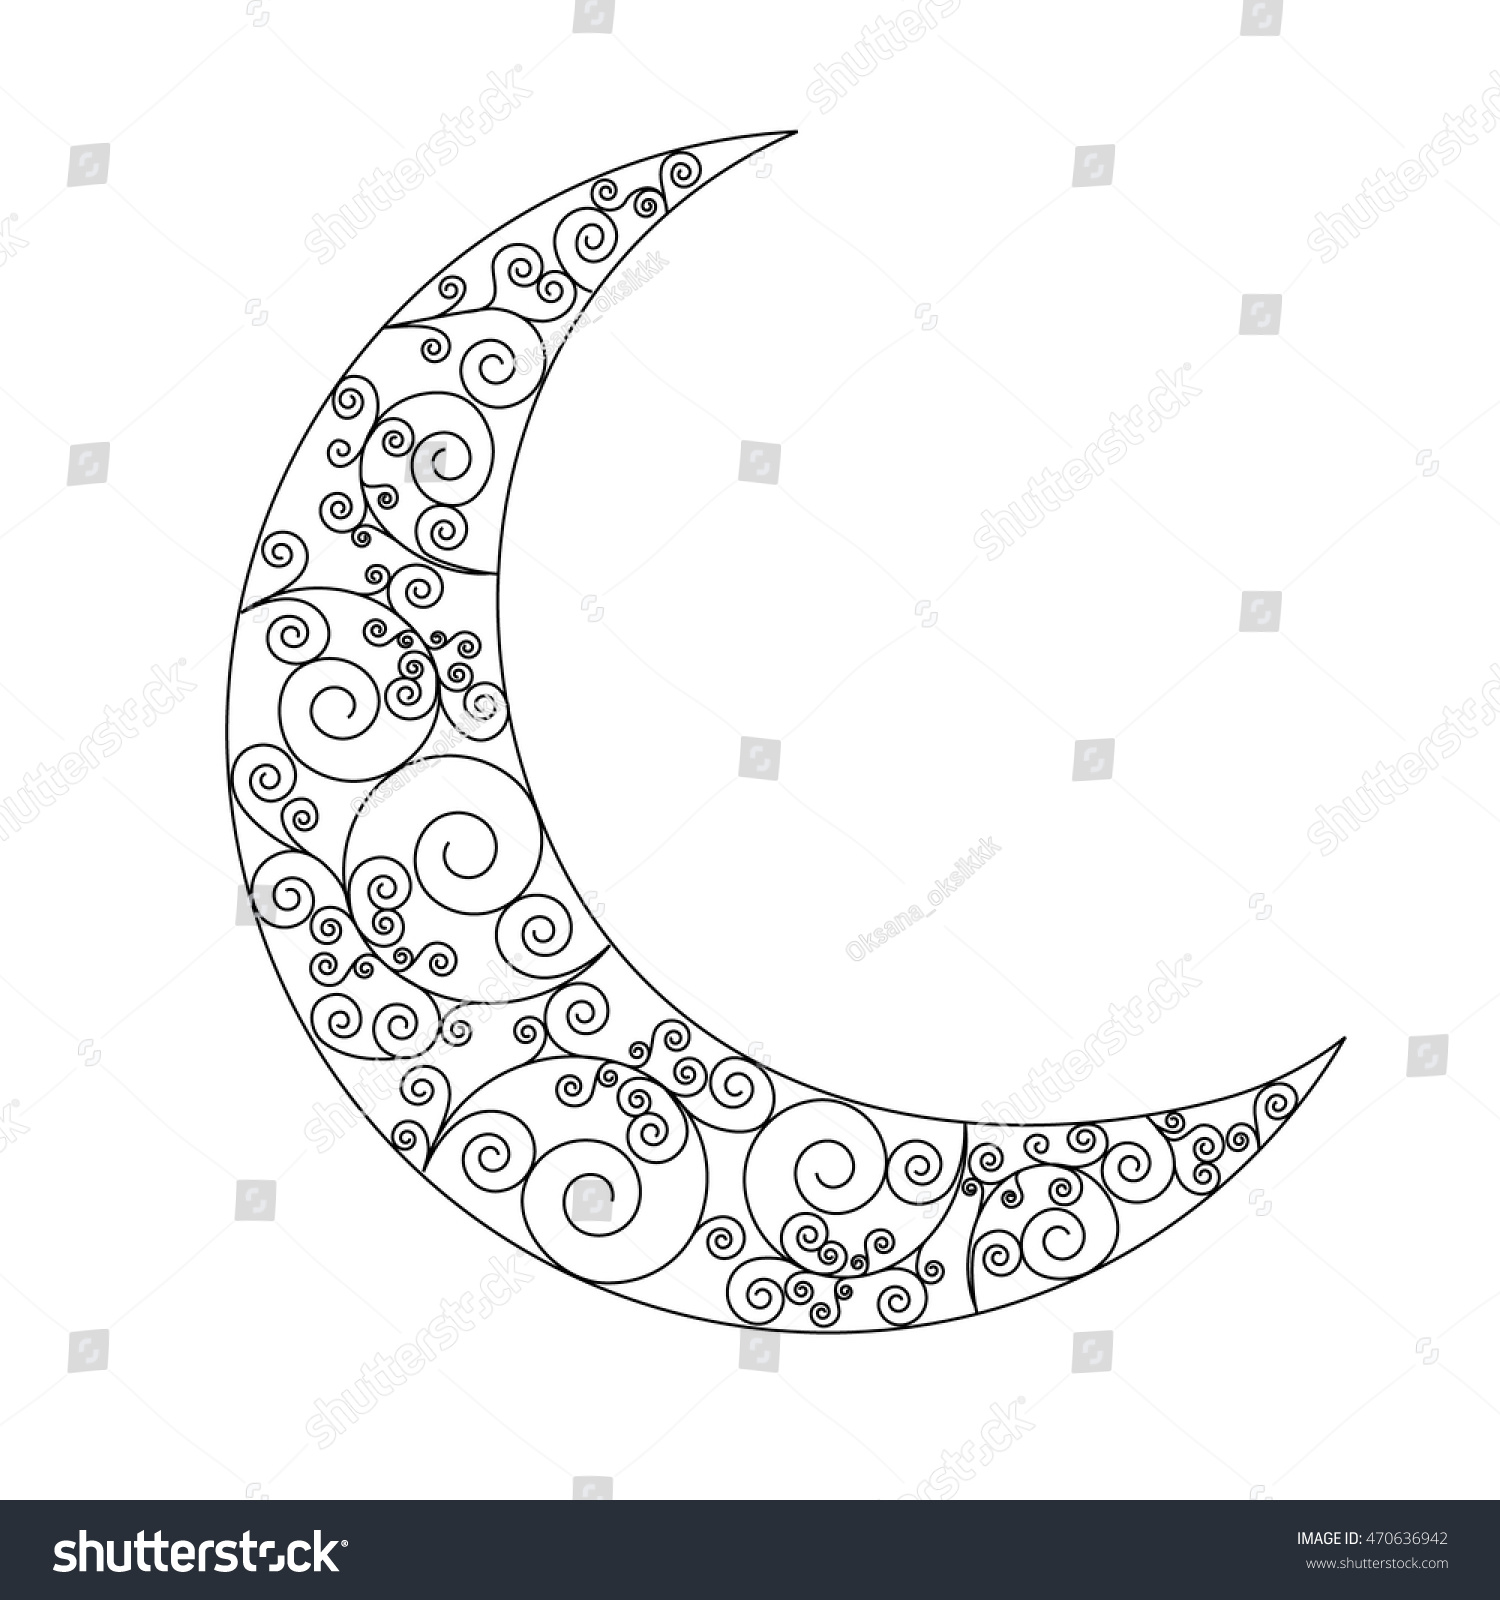 Decorated Swirl Crescent Moon Symbol Black Stock Vector Royalty